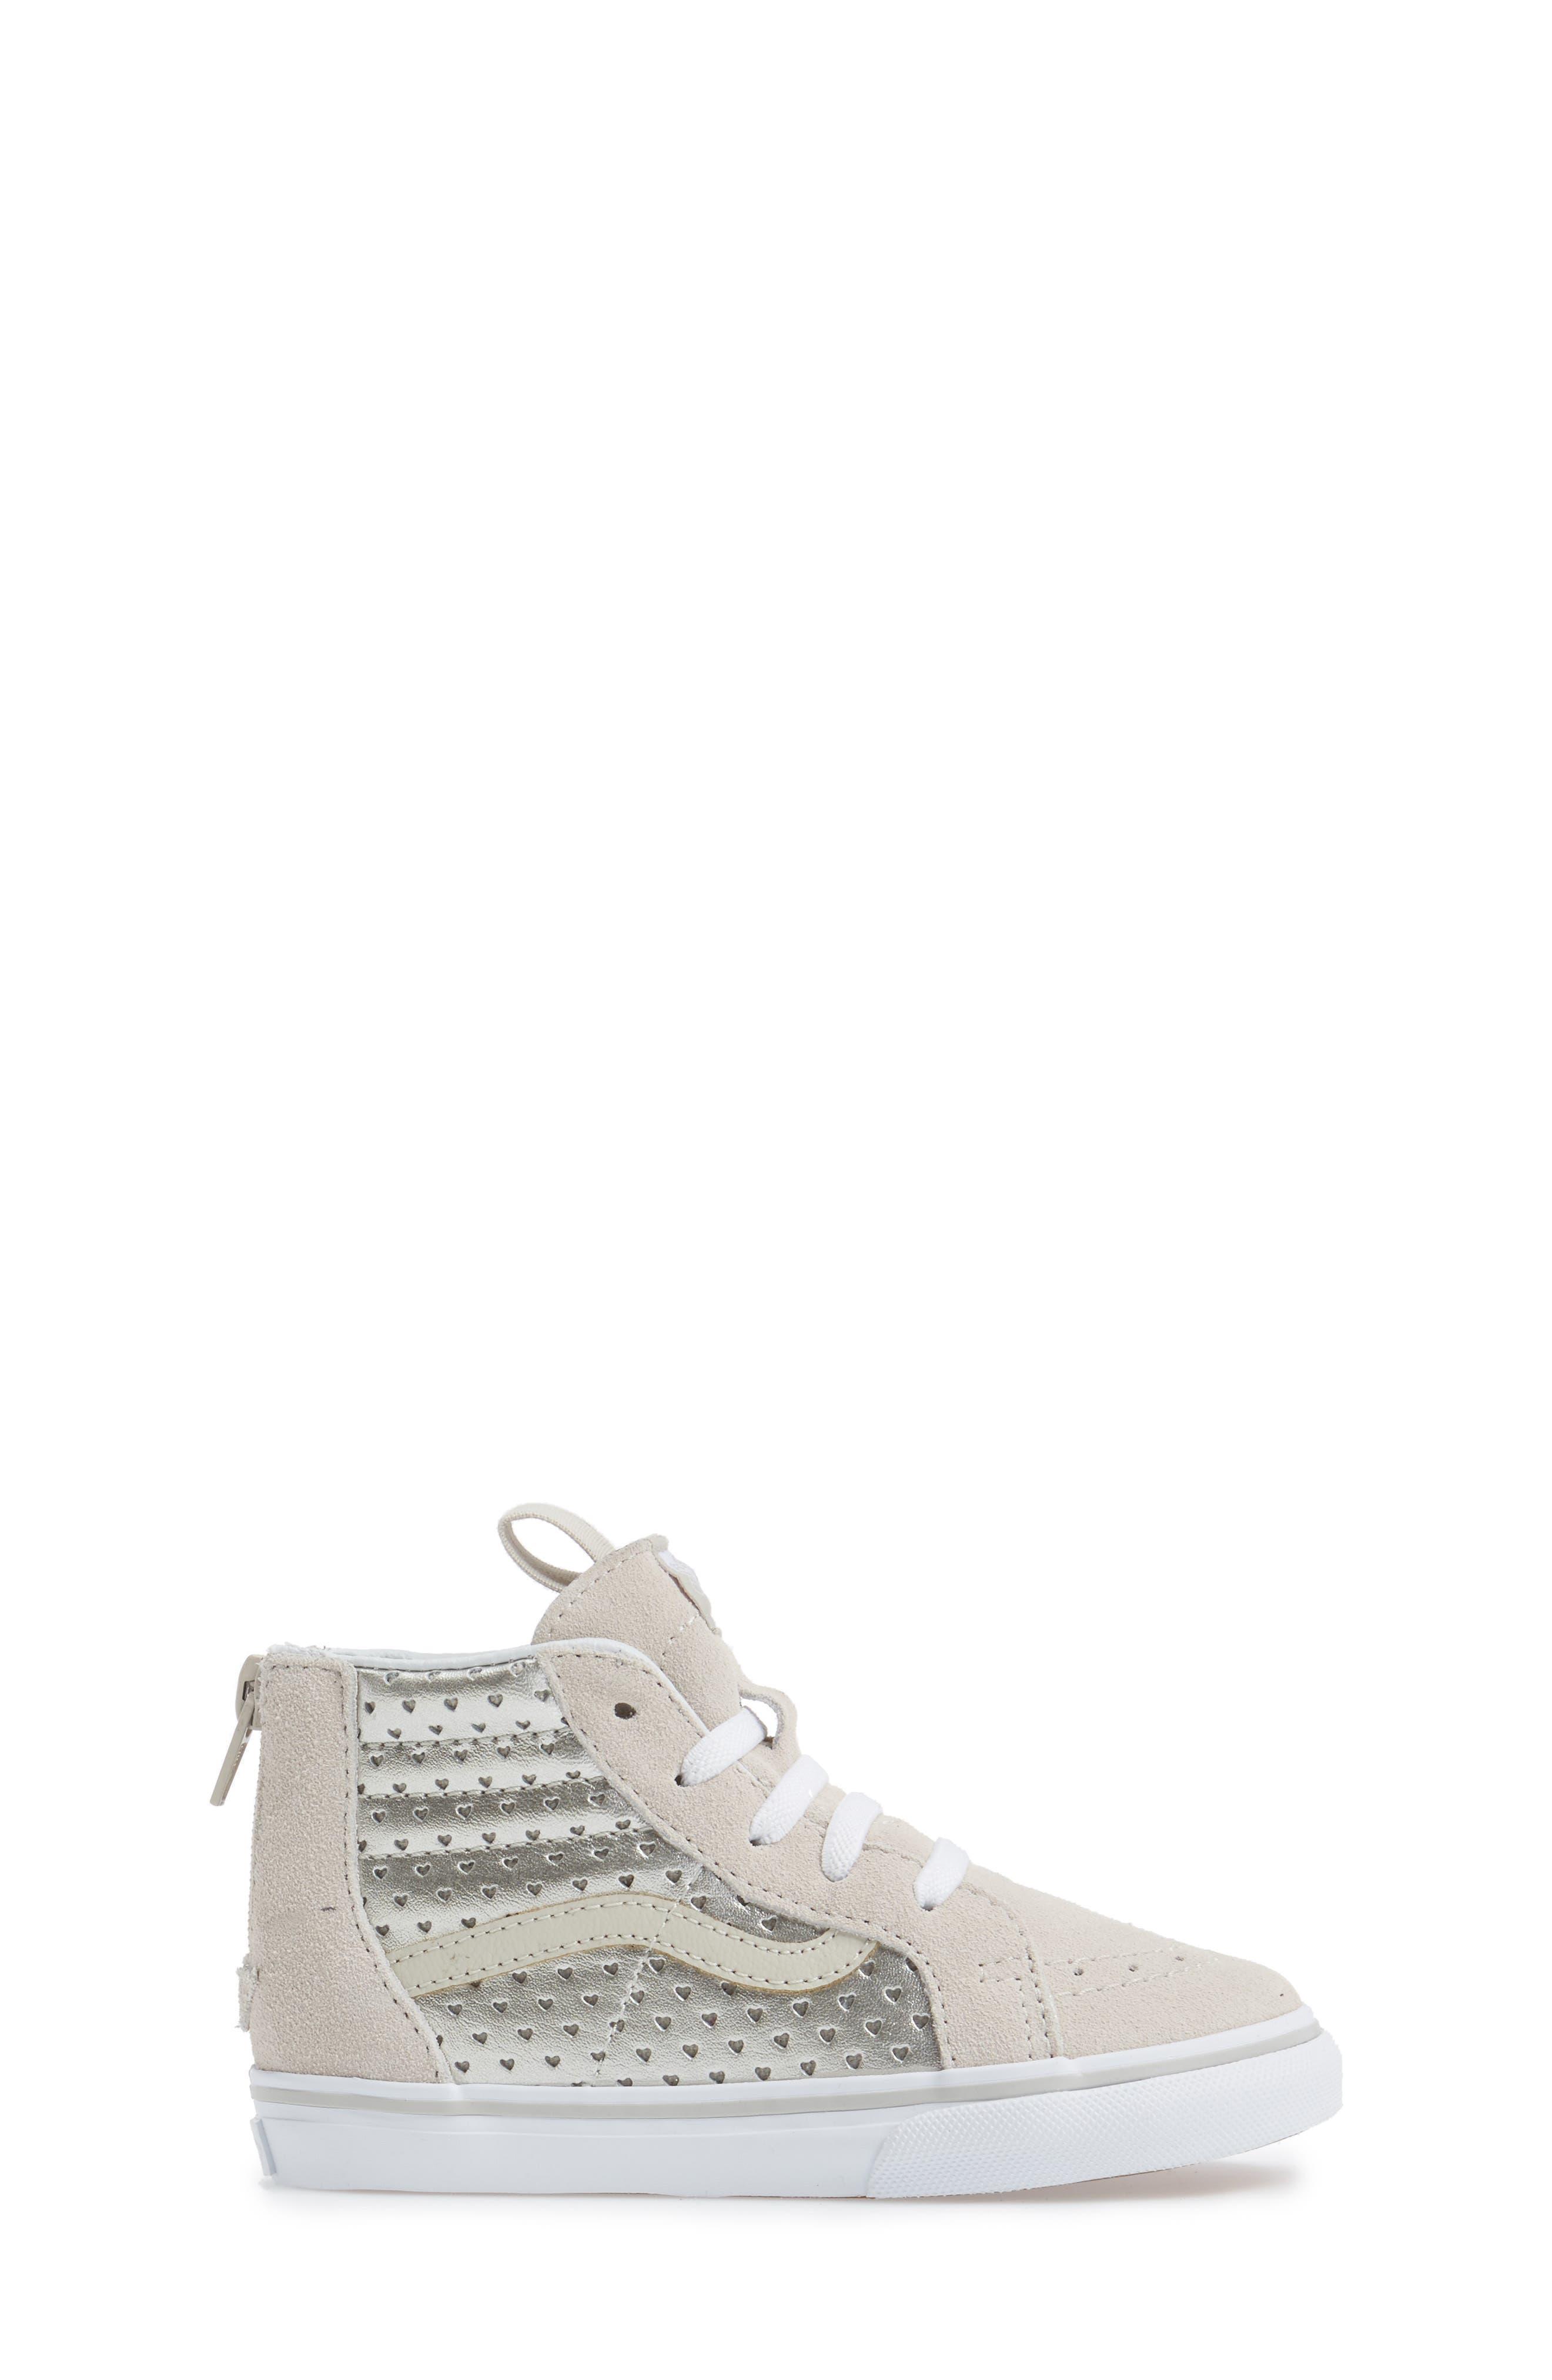 Sk8-Hi Zip Sneaker,                             Alternate thumbnail 2, color,                             Silver Metallic Heart Suede